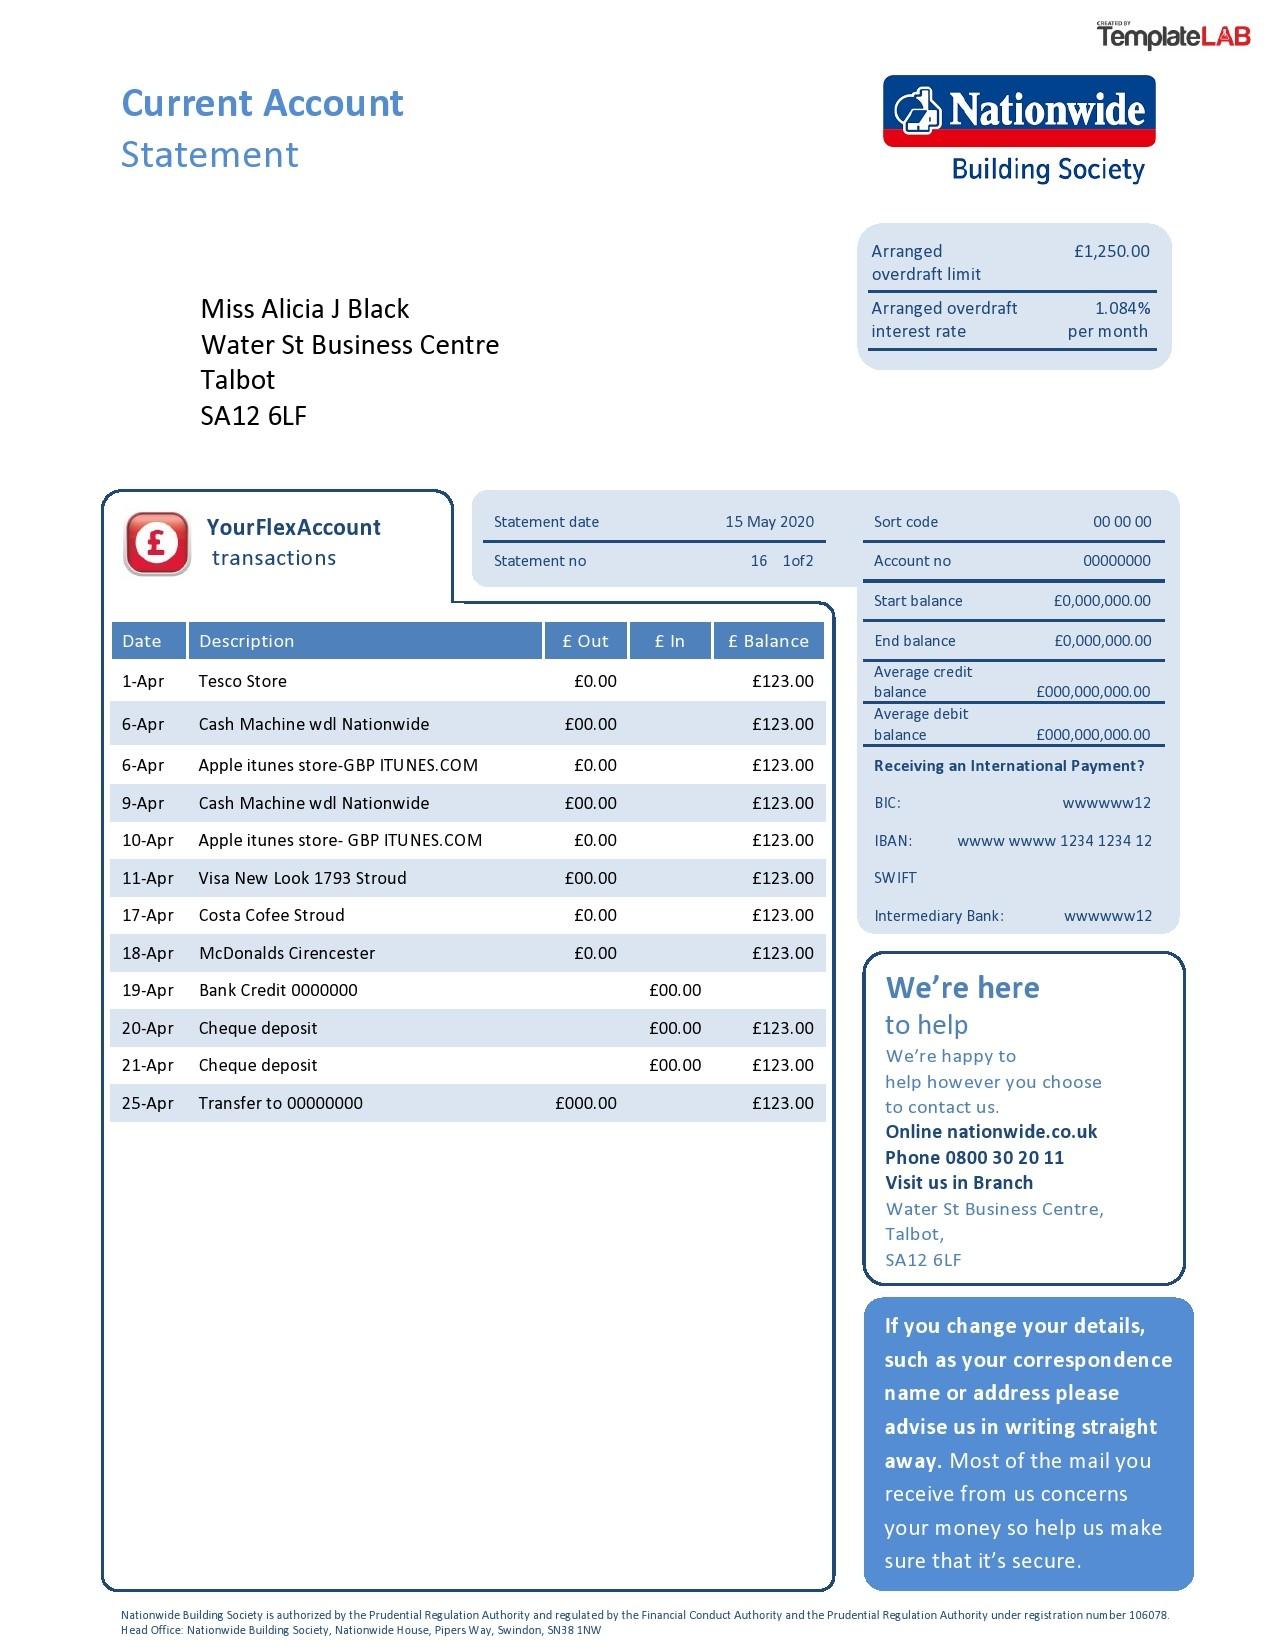 Free Nationwide Bank Statement - TemplateLab.com